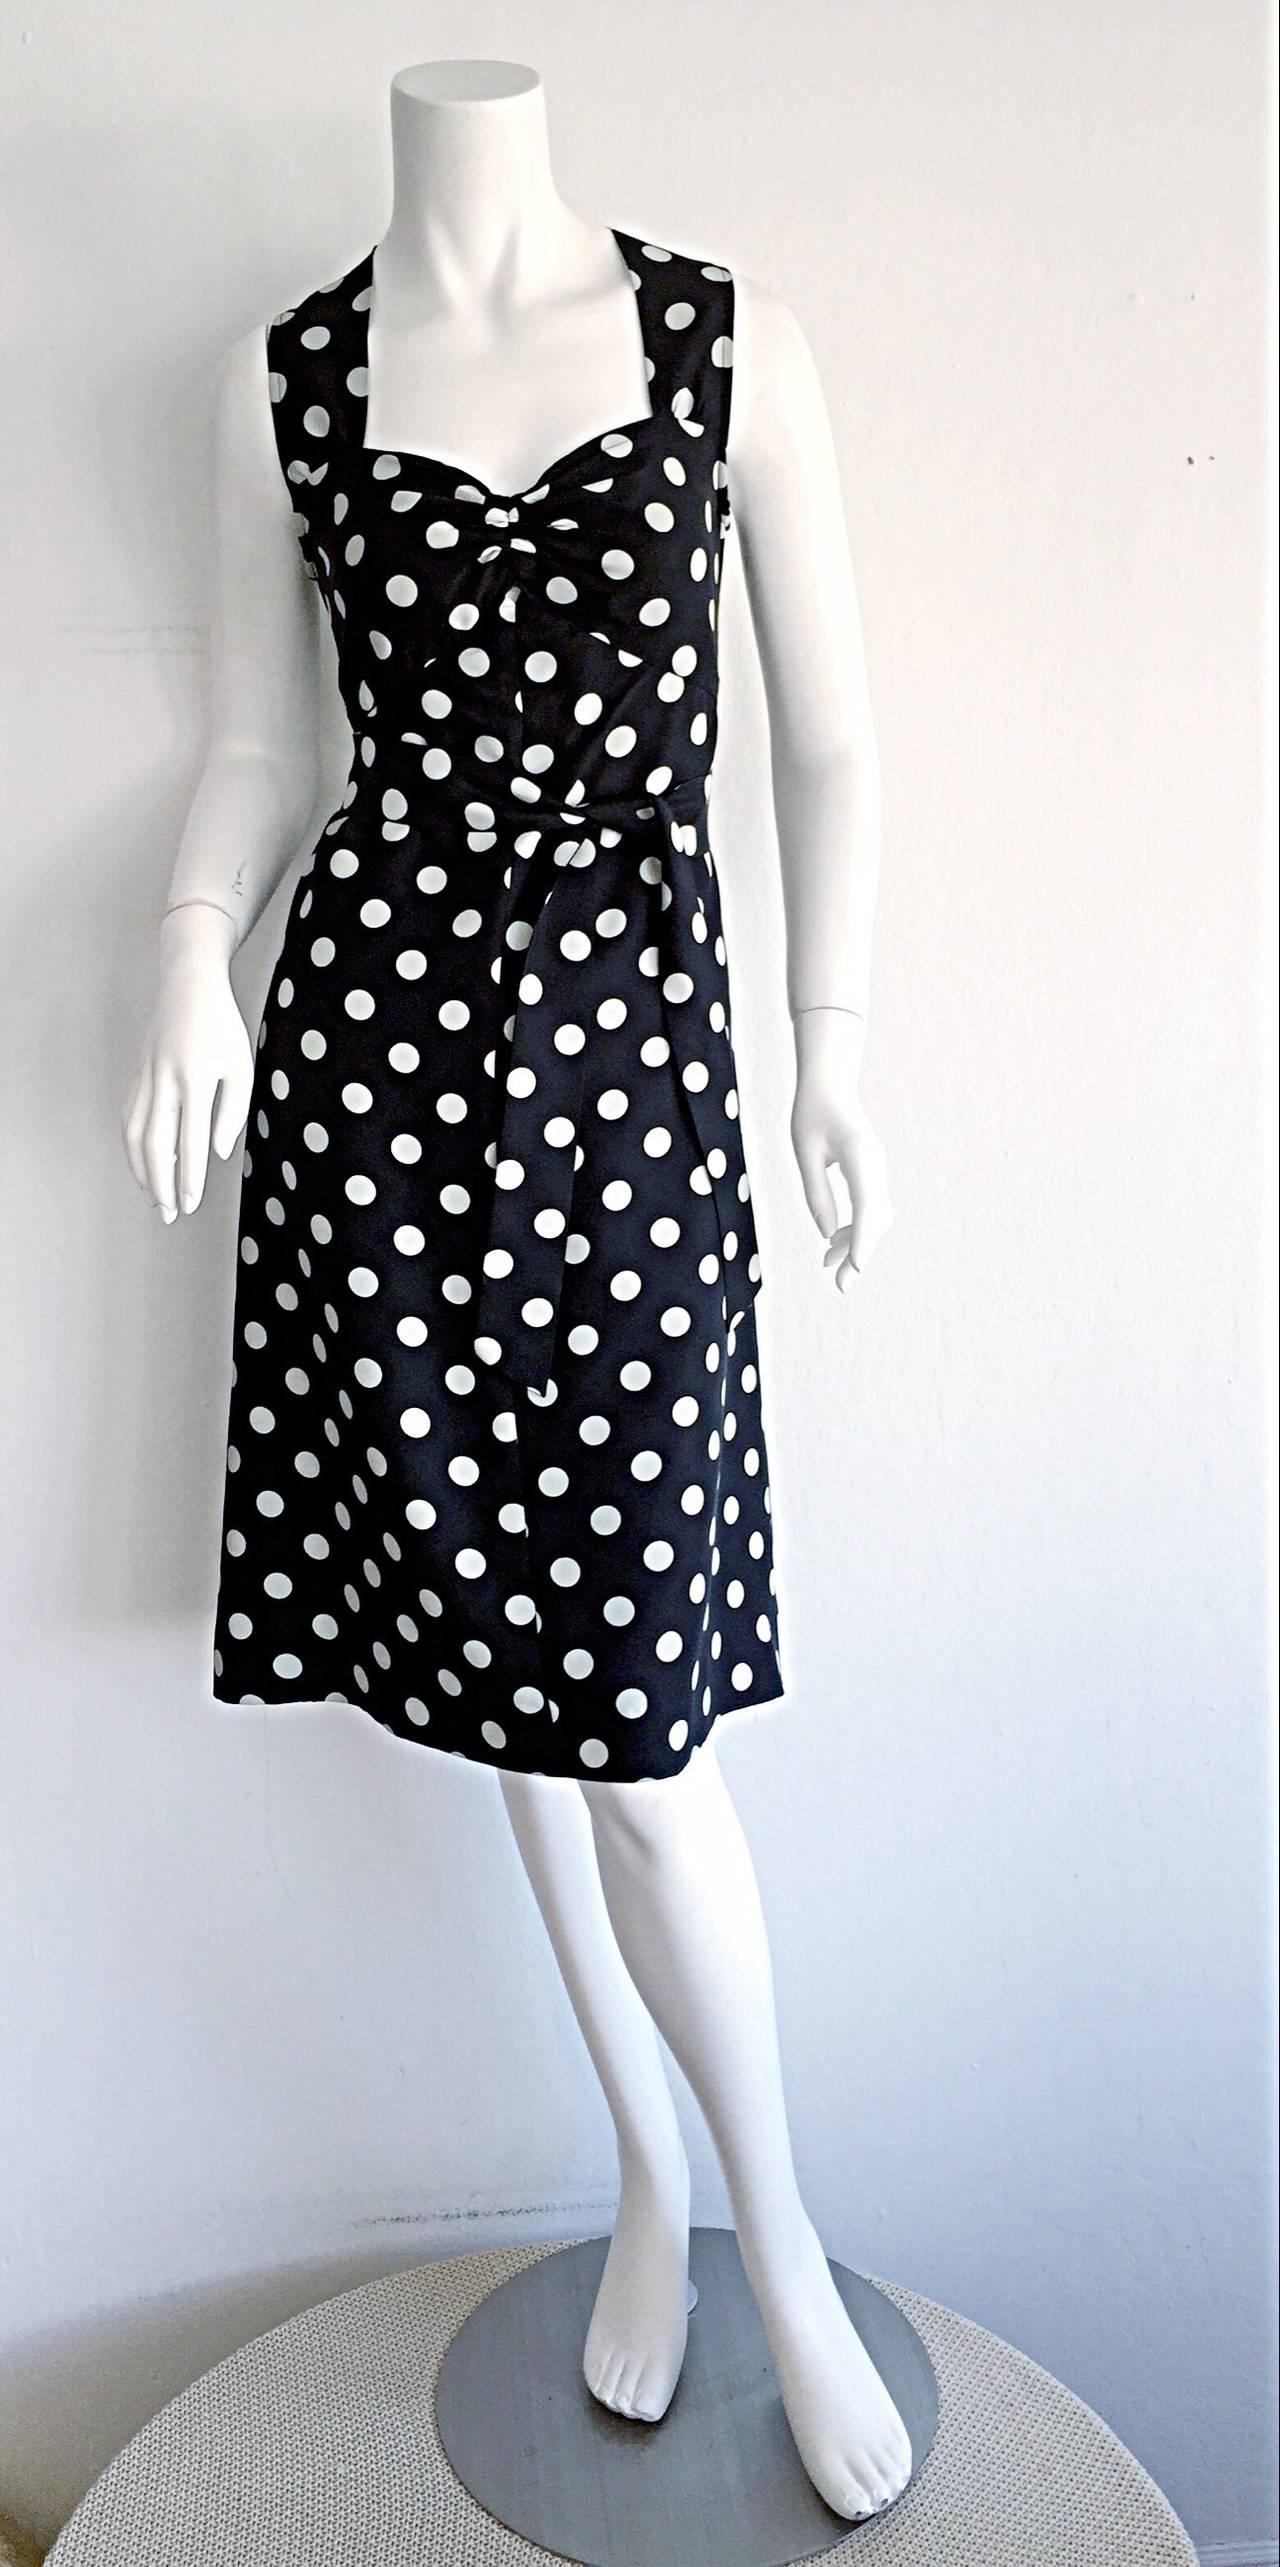 1980s Saint Laurent Rive Gauche  Navy Blue & White Polka Dot Babydoll Bow Dress 6